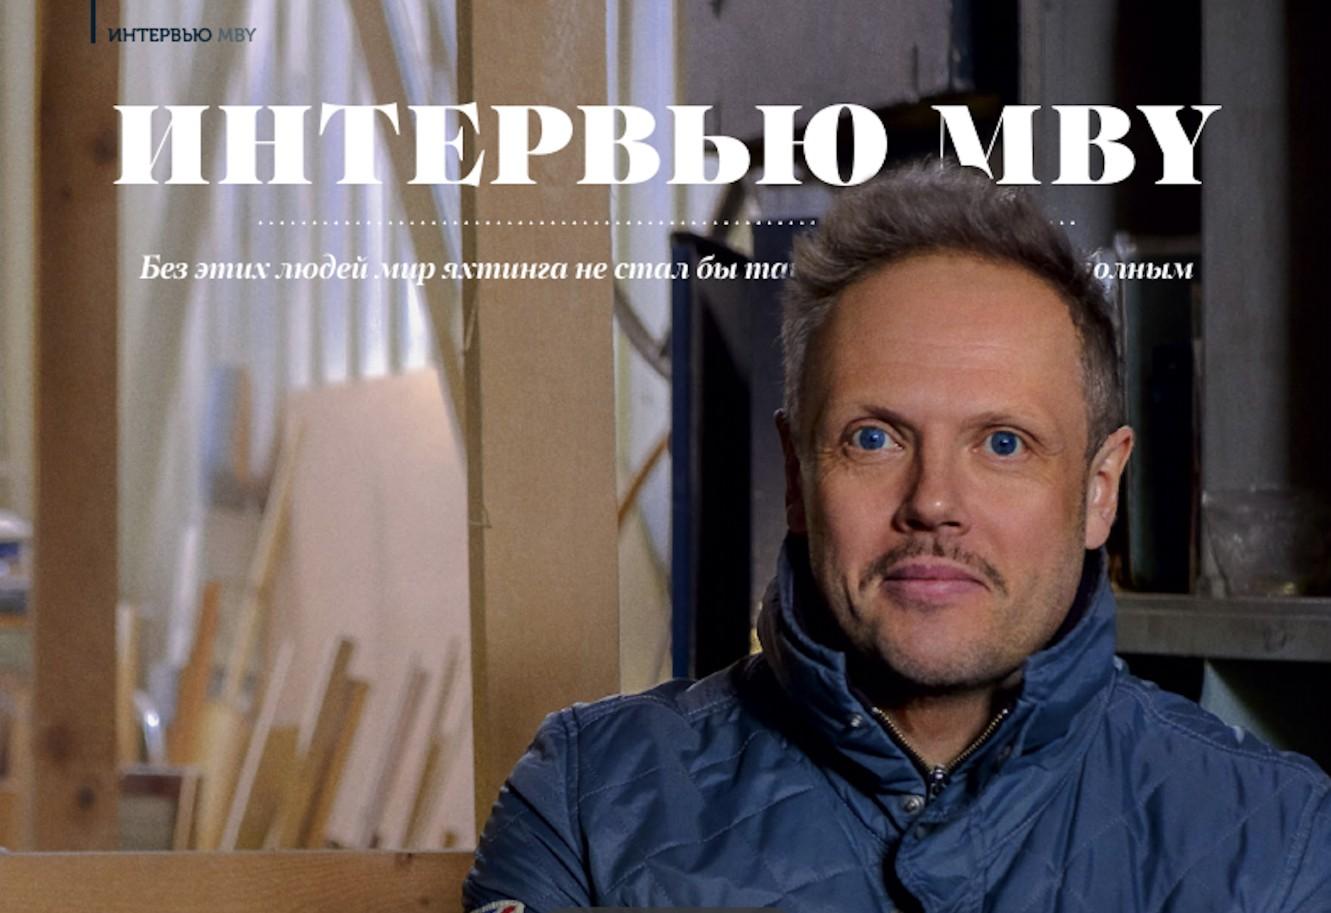 Интервью Олега Гусева журналу MBY